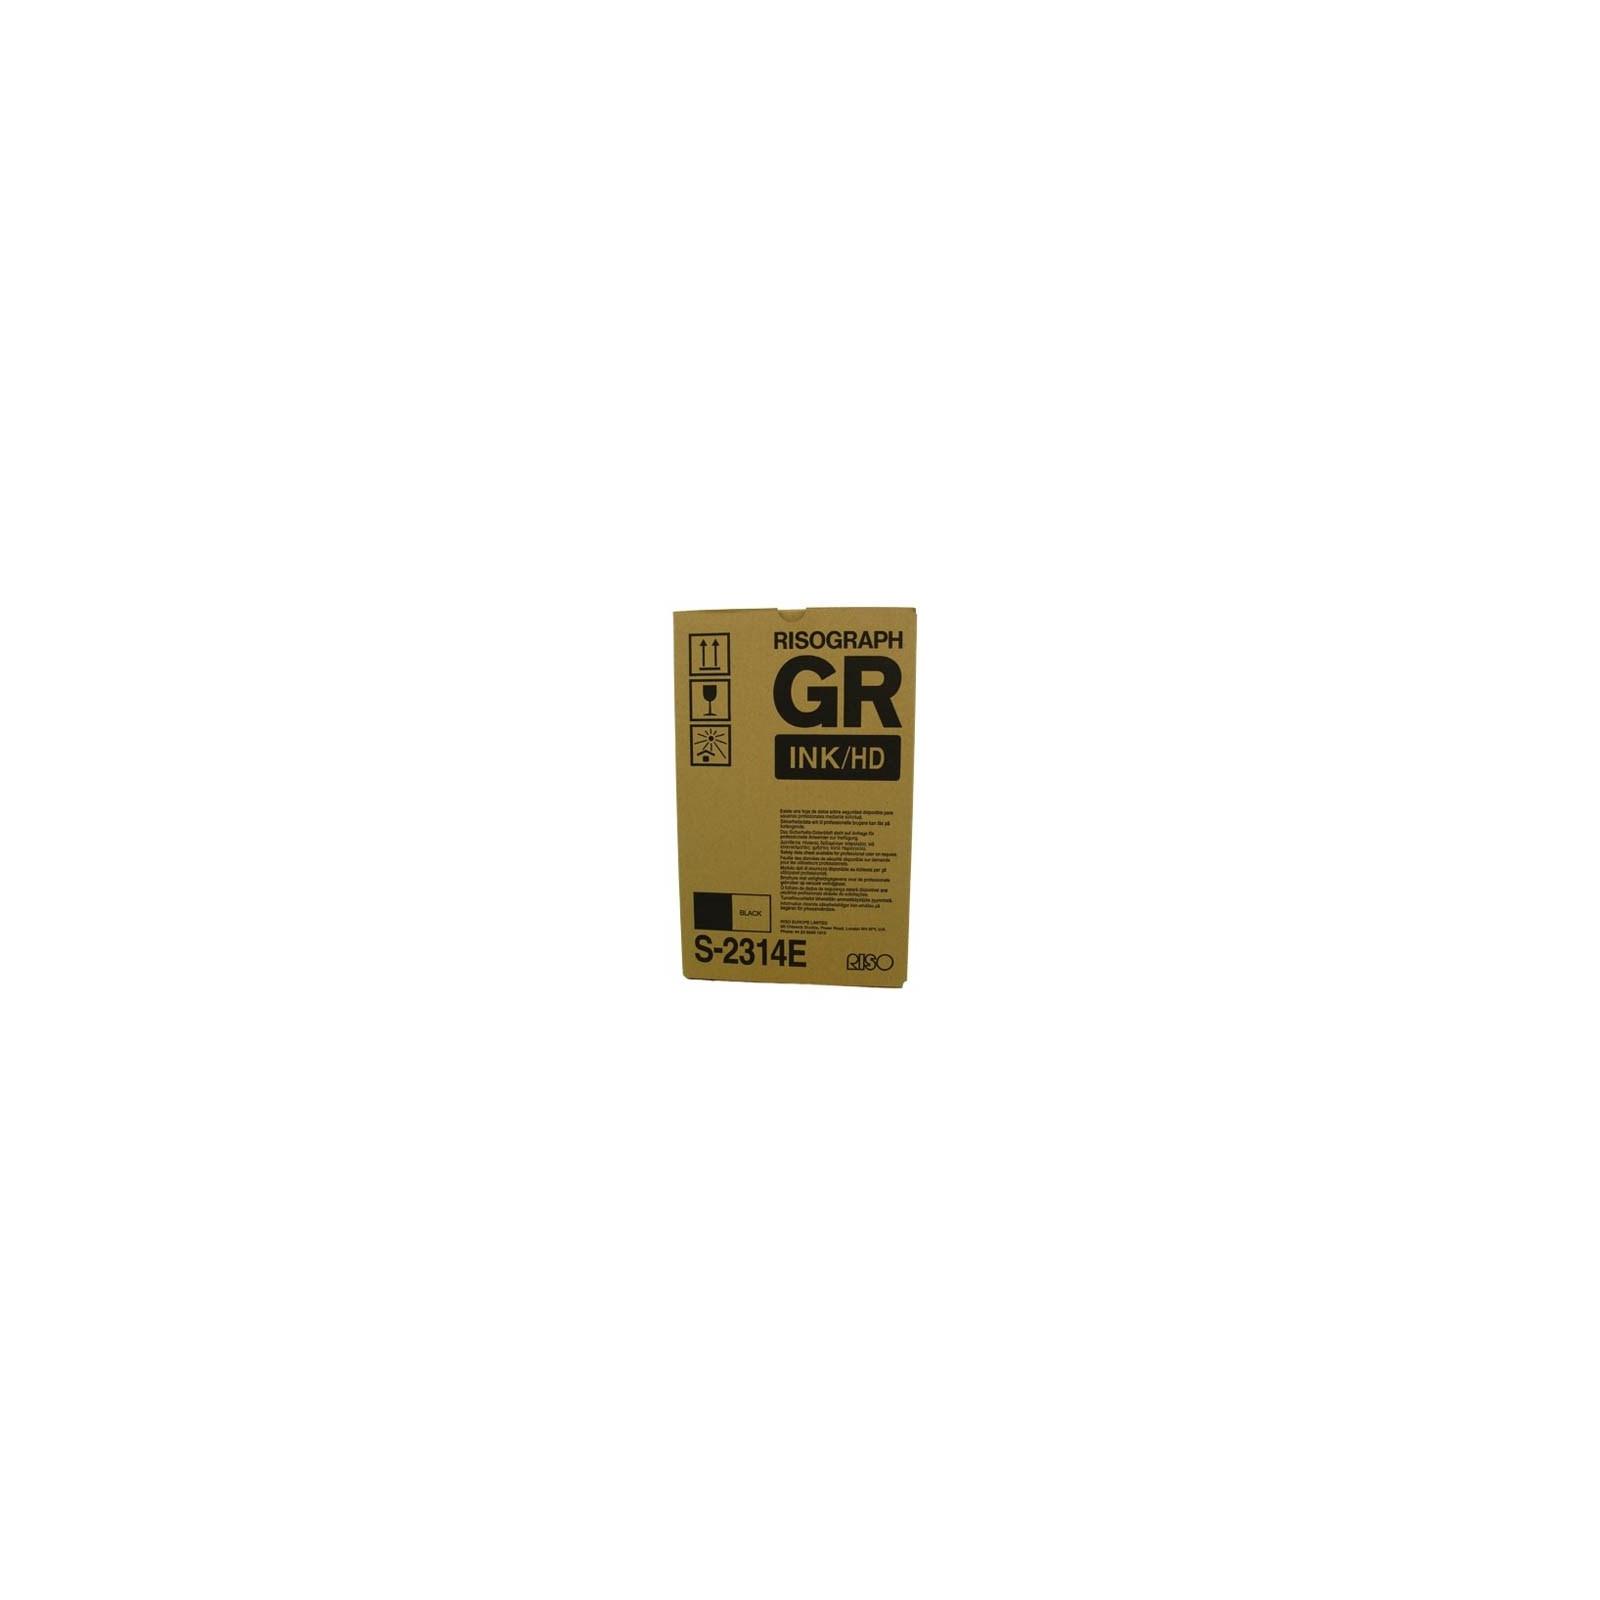 Краска RISO HD GR black (для GR-3770) 25К (S-2314E)